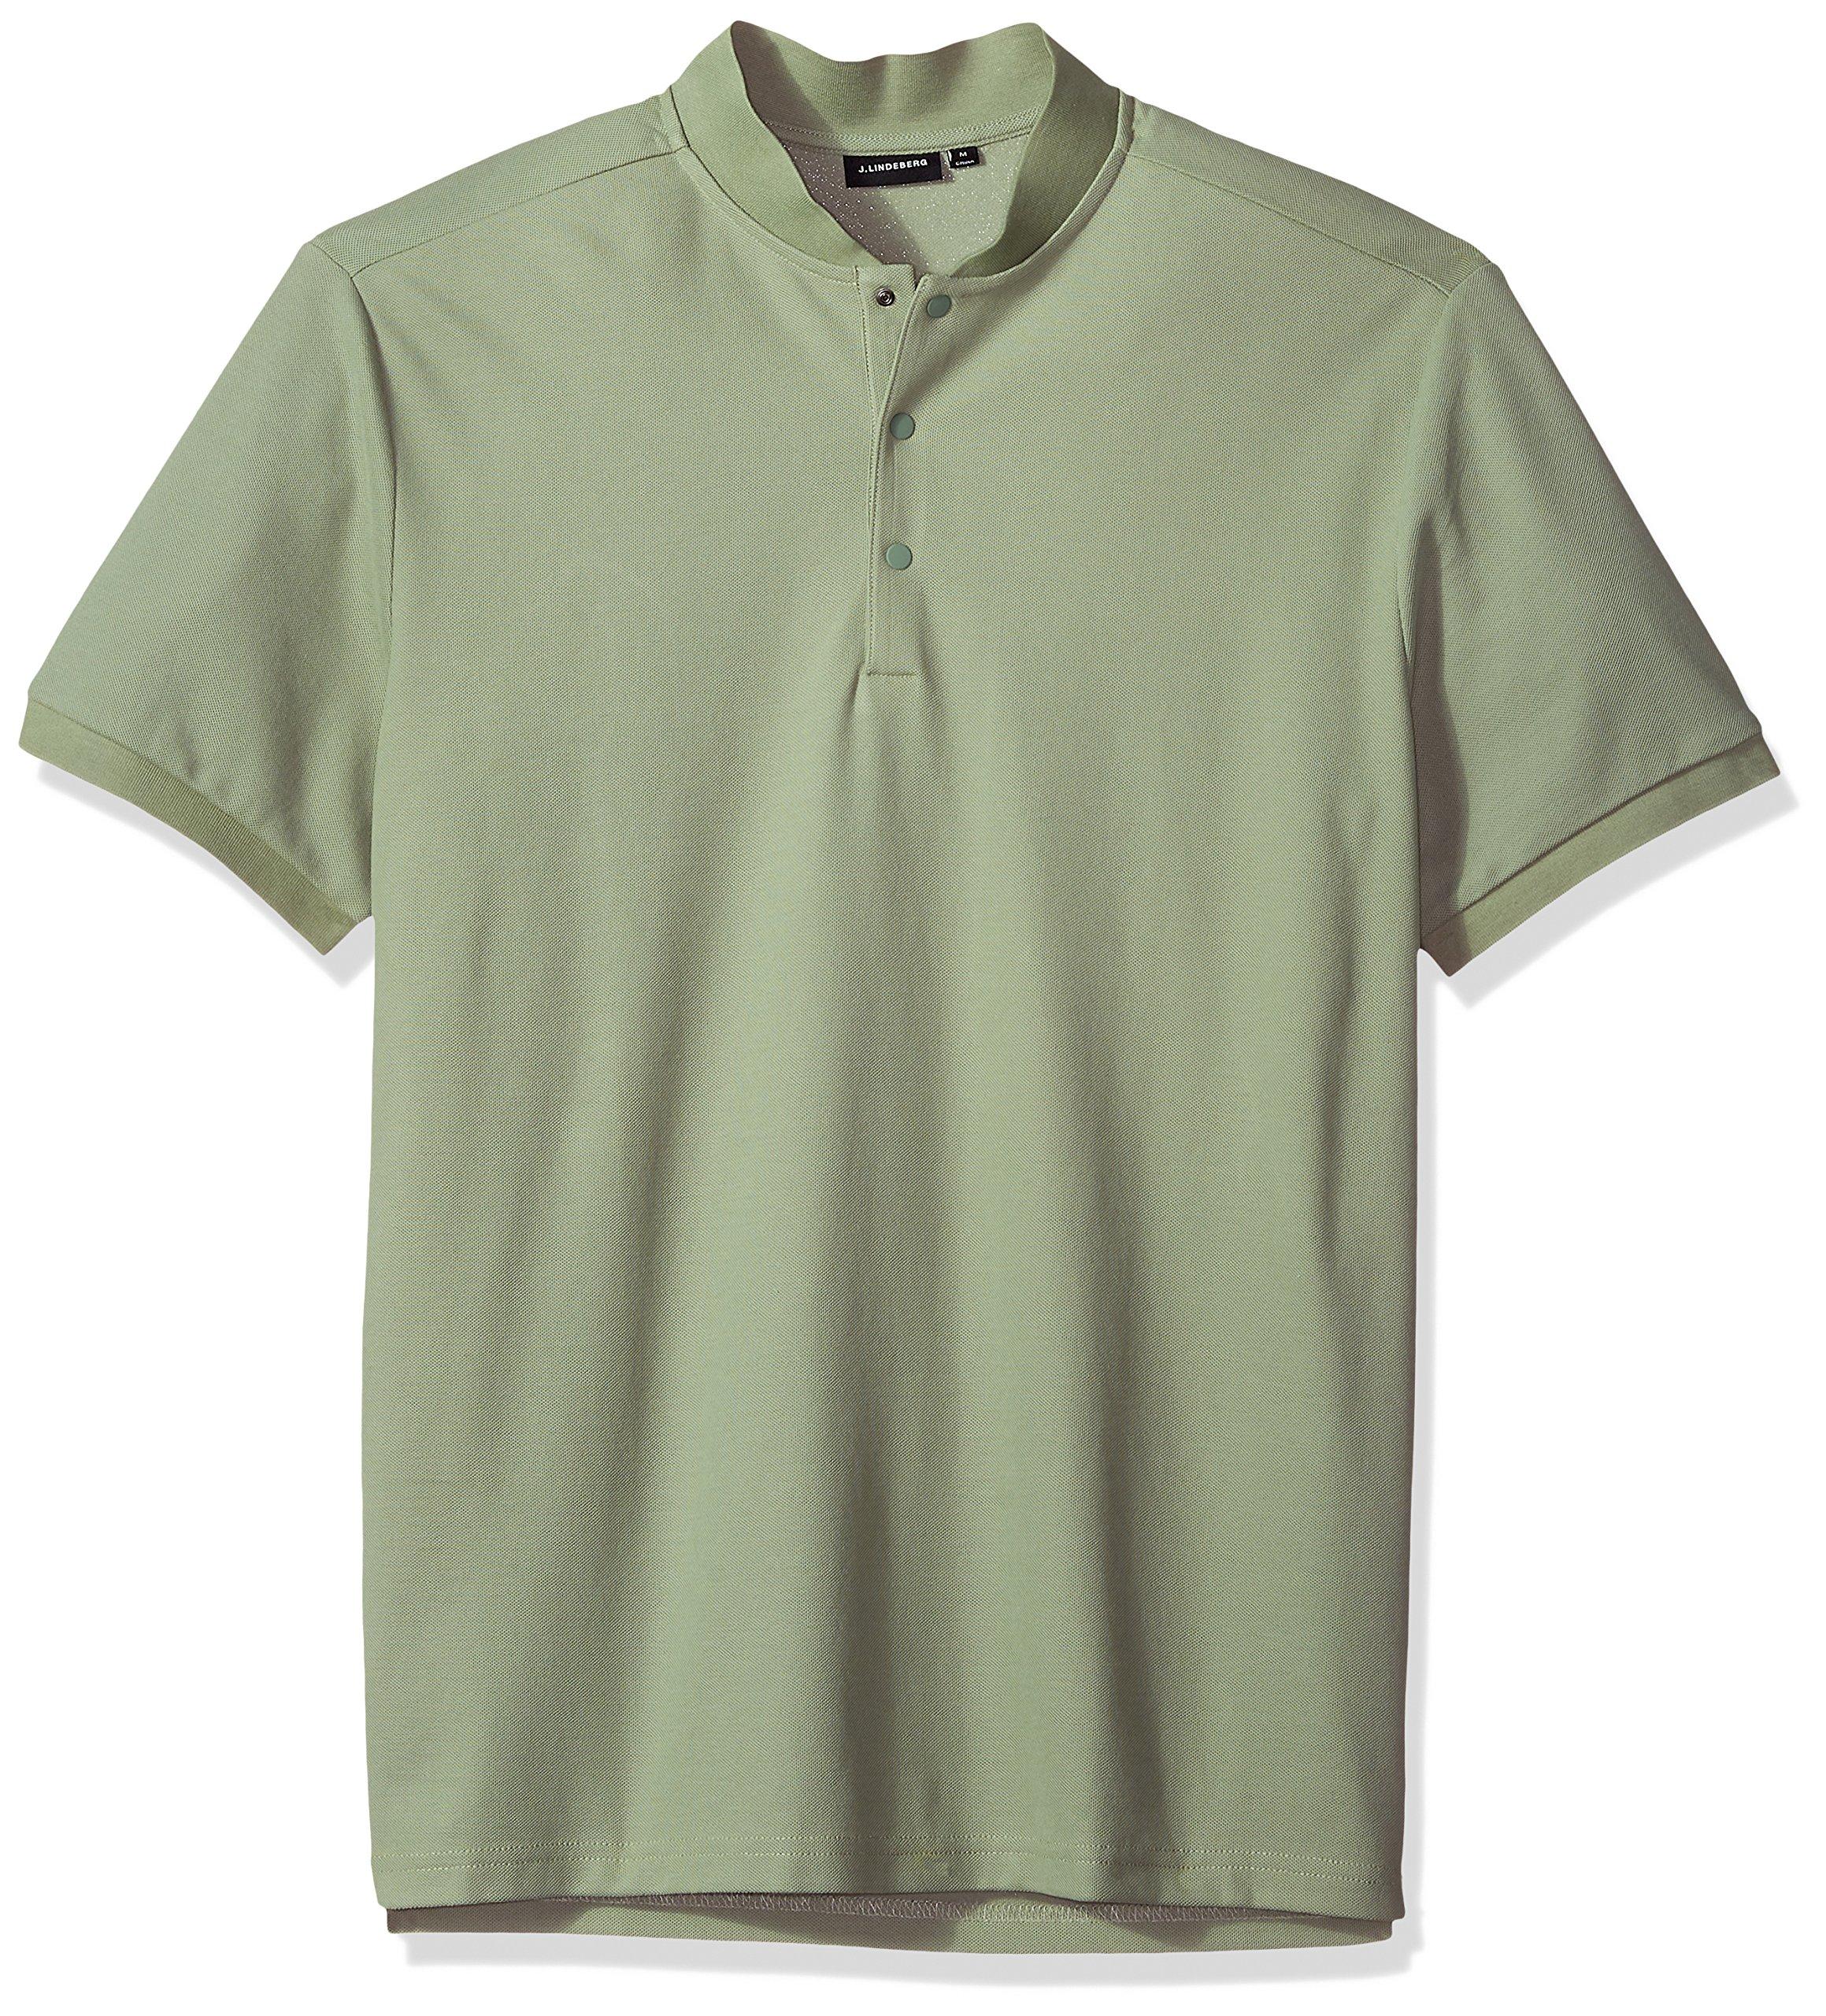 J.Lindeberg Men's Athletic Polo Shirt, Hedge Green, Medium